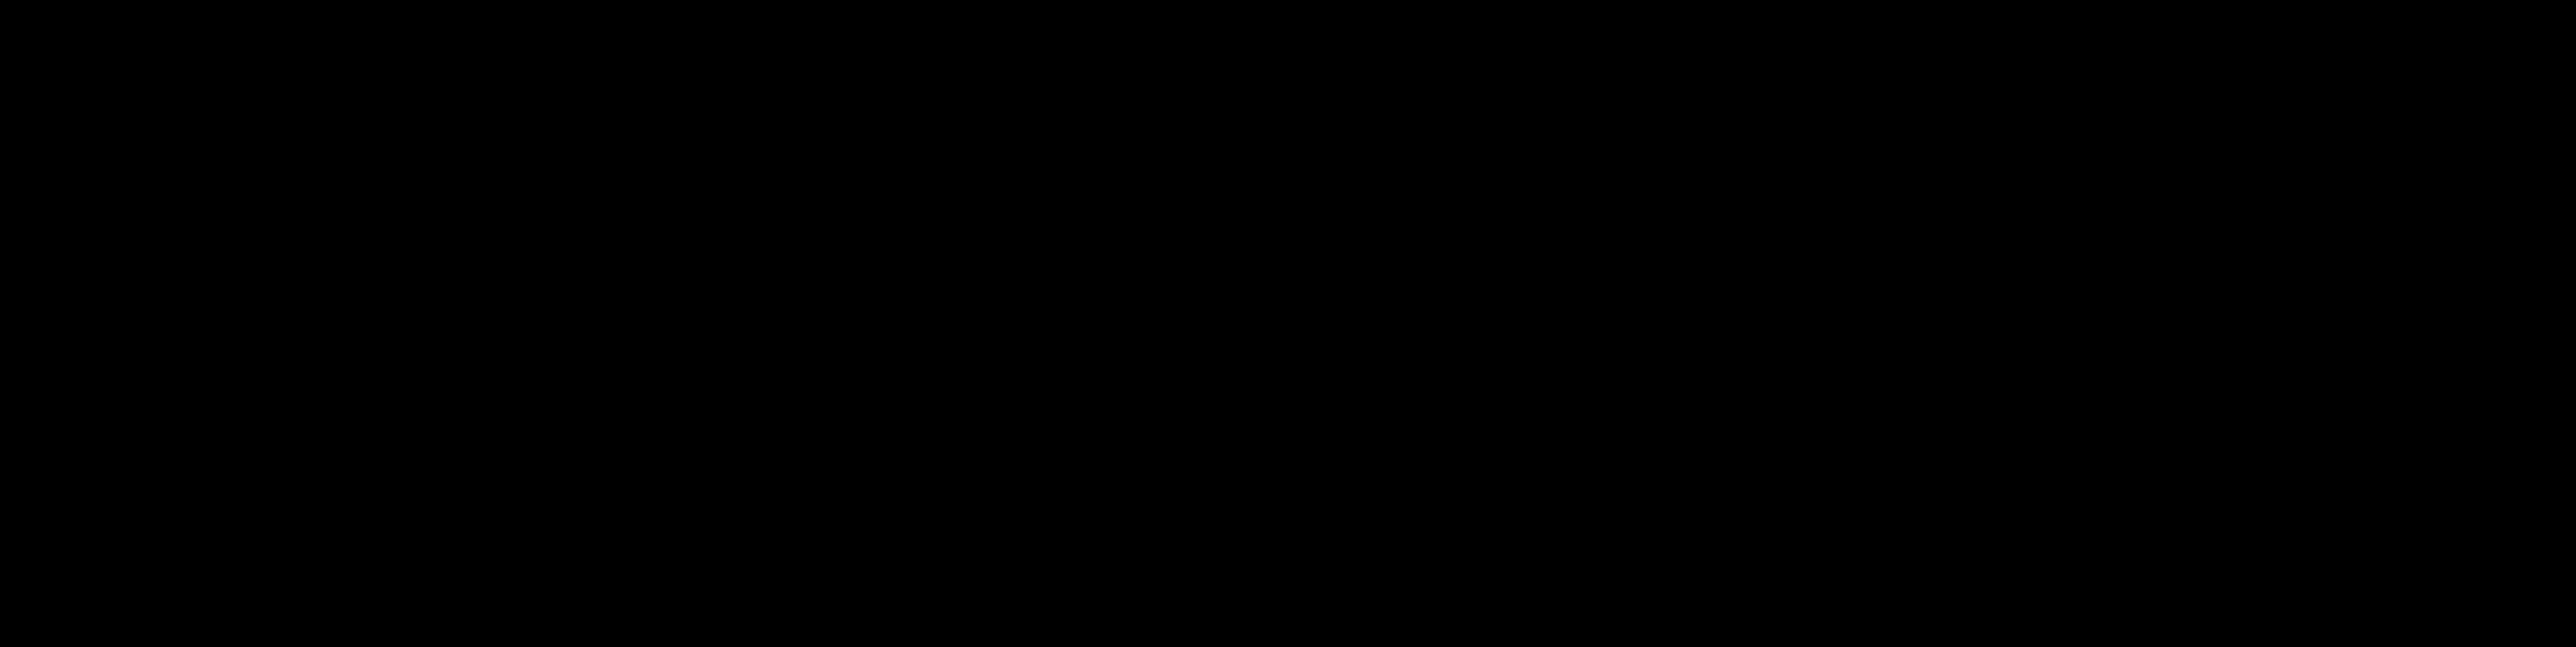 forbes logo 6 1 - Forbes Logo